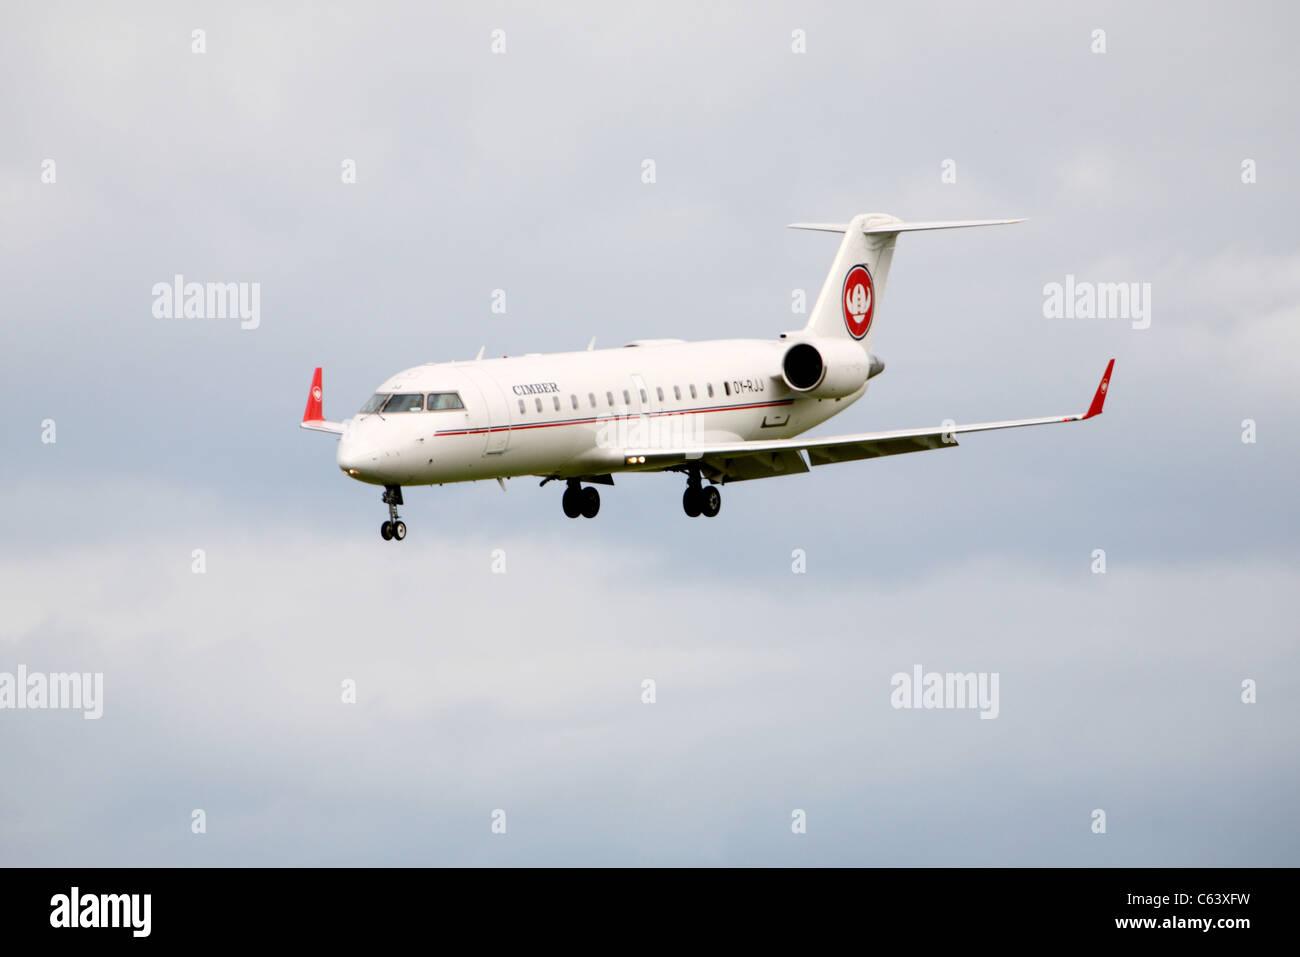 Canadair Regional Jet - Stock Image